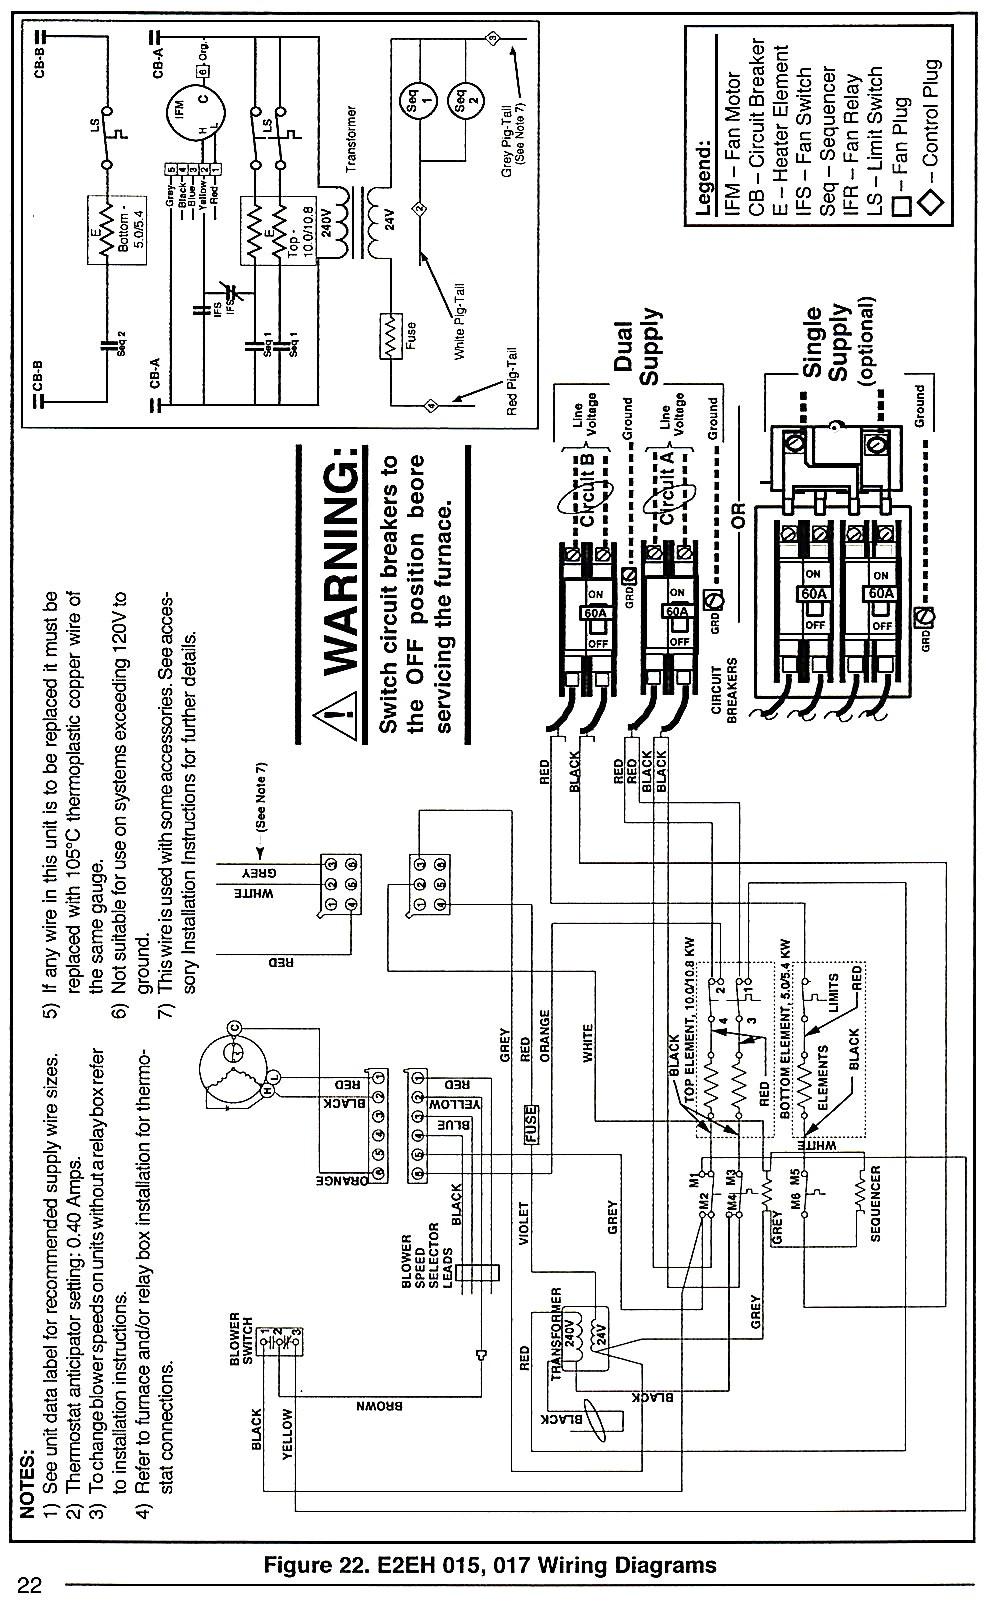 Intertherm Electric Furnace Wiring Diagram Gorgeous Model For - Intertherm Electric Furnace Wiring Diagram